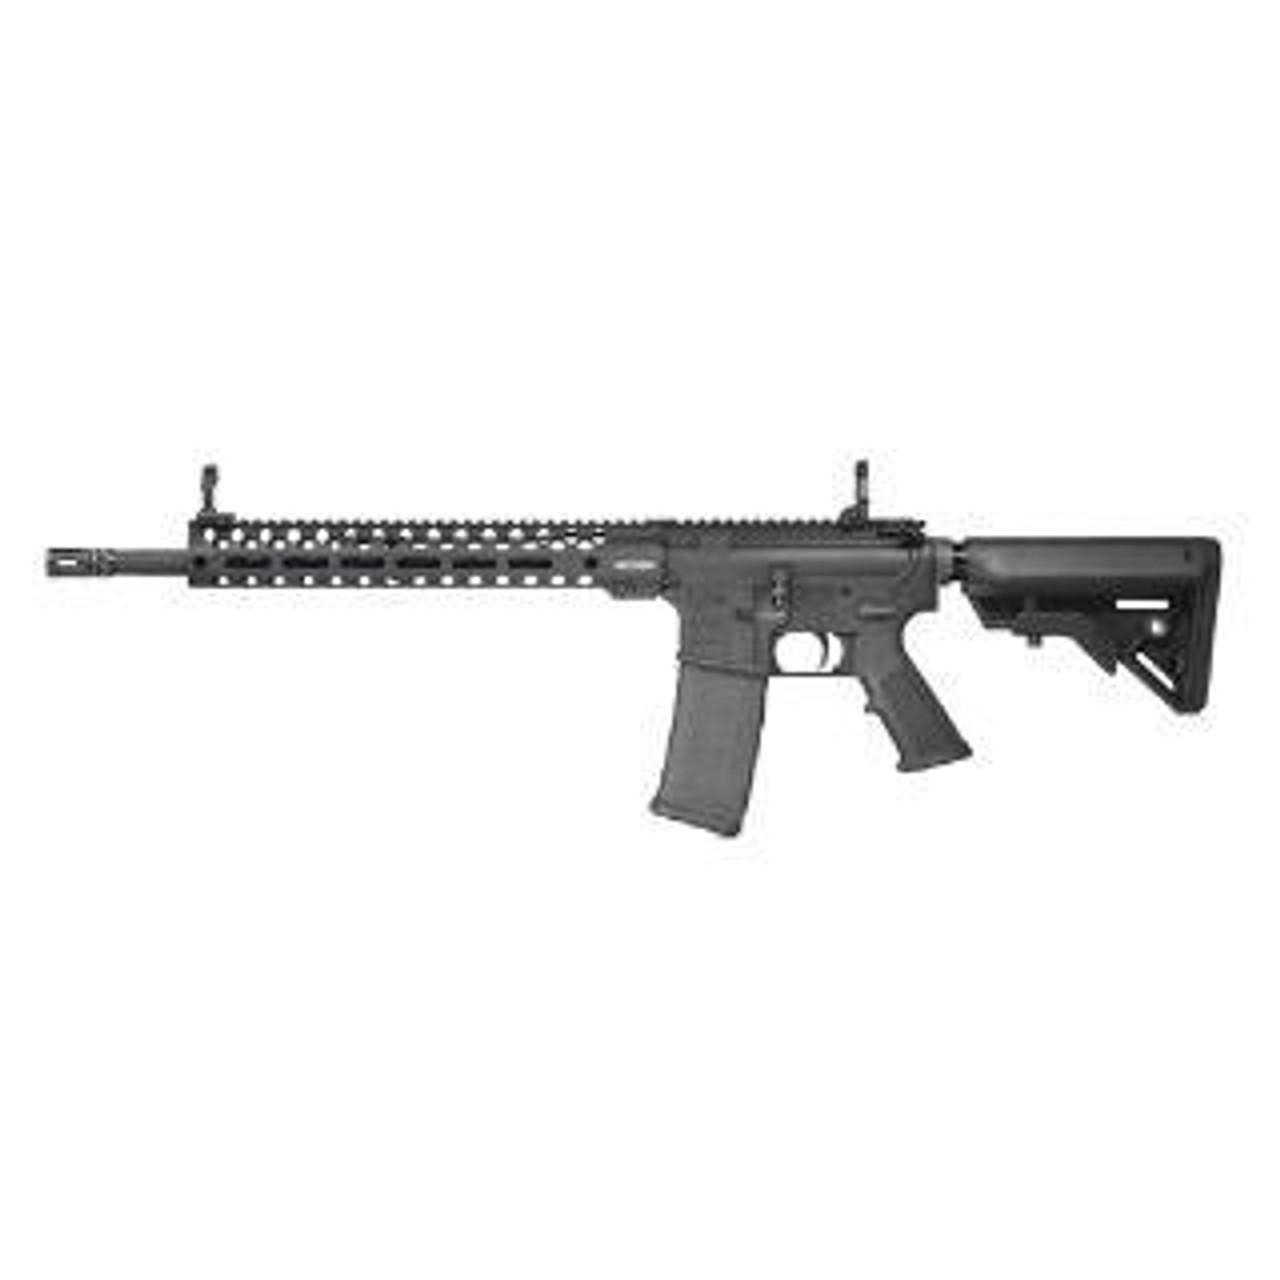 Colt Enhanced Patrol CALIFORNIA LEGAL- 5.56